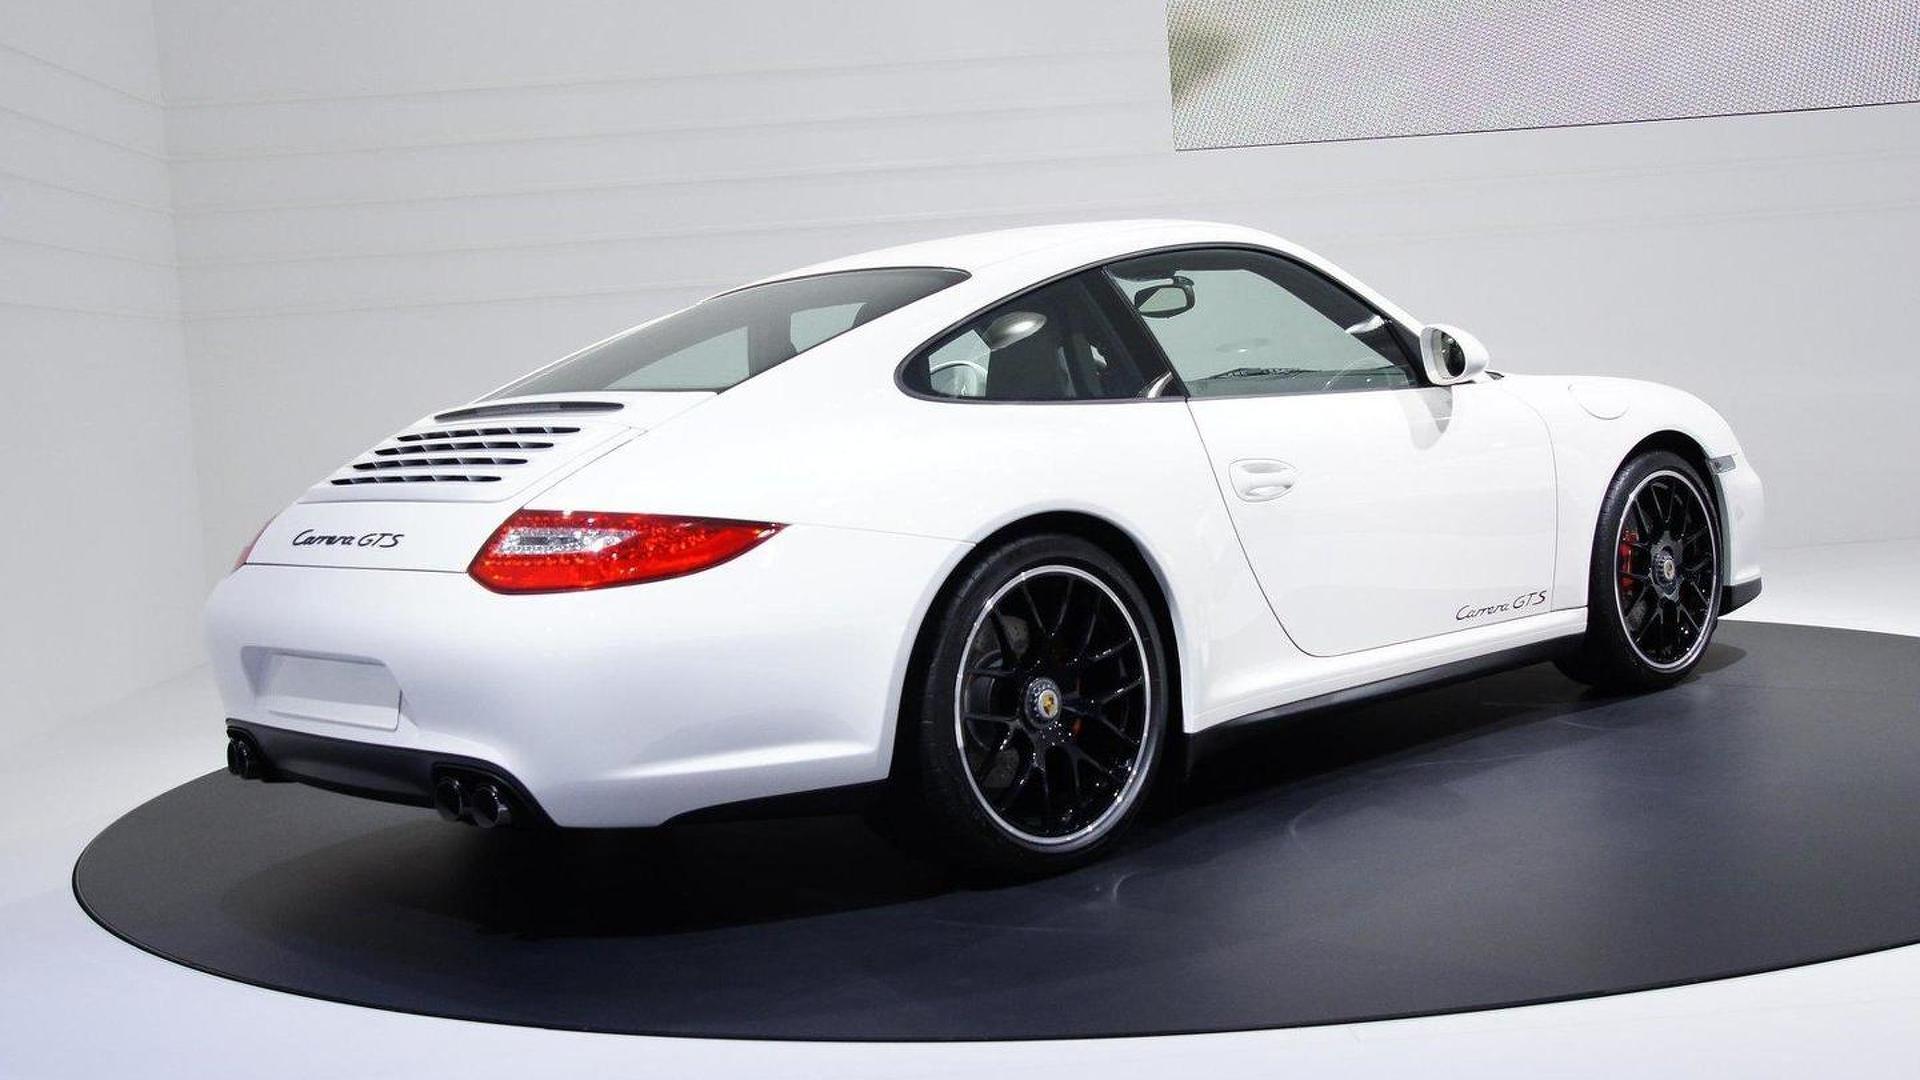 Porsche 911 GTS on the Paris show floor